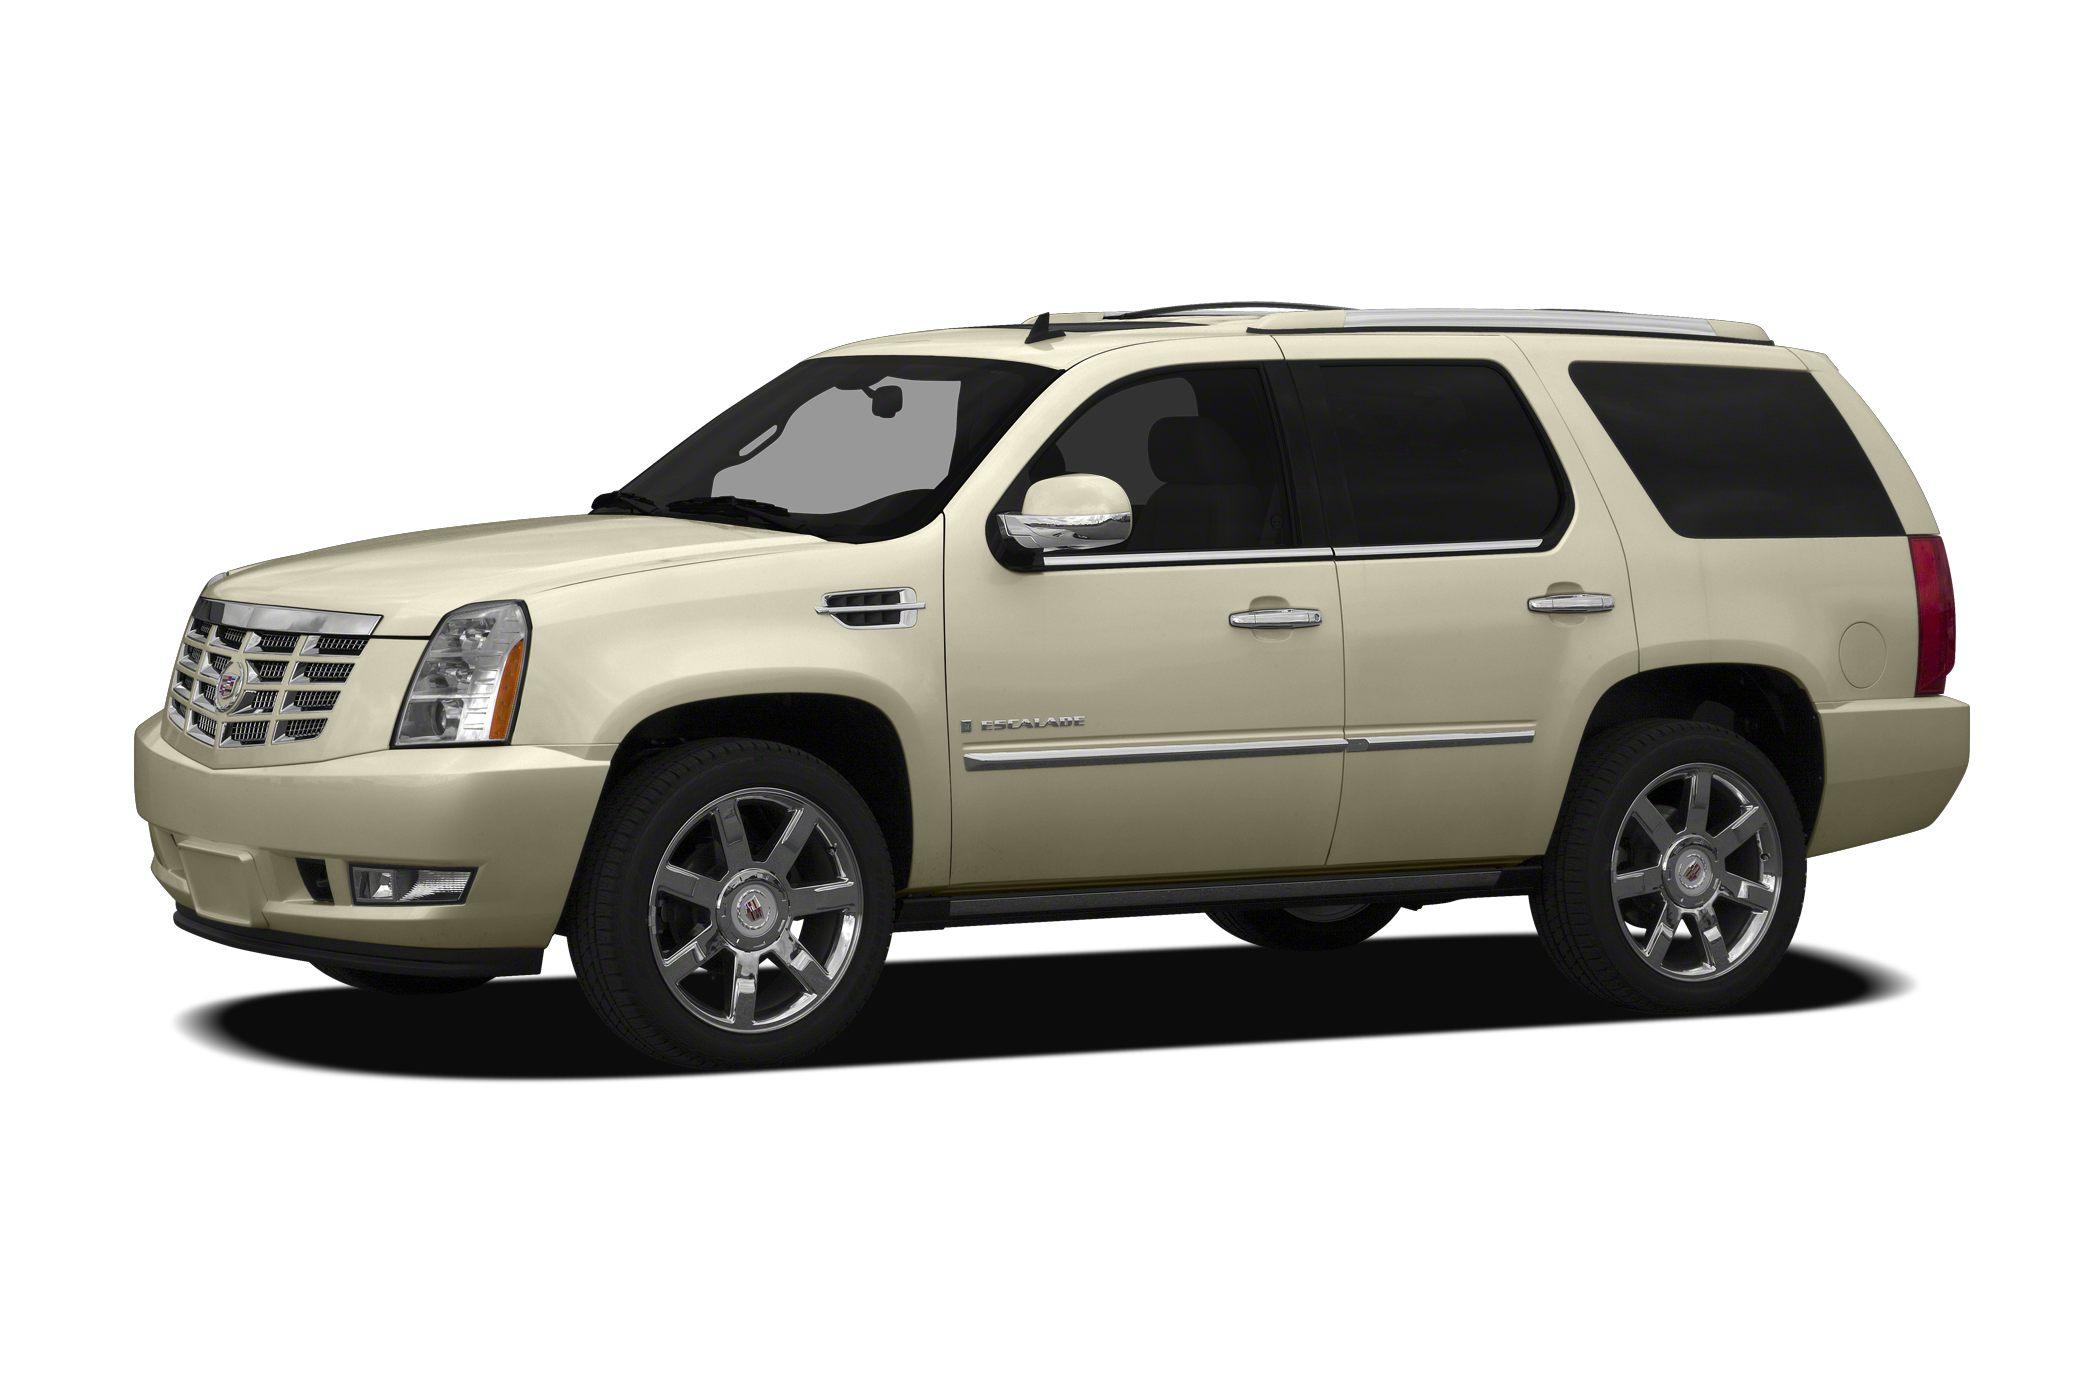 2012 Cadillac Escalade Luxury Miles 99366Color Black Stock 727798A VIN 1GYS4BEF3CR202086